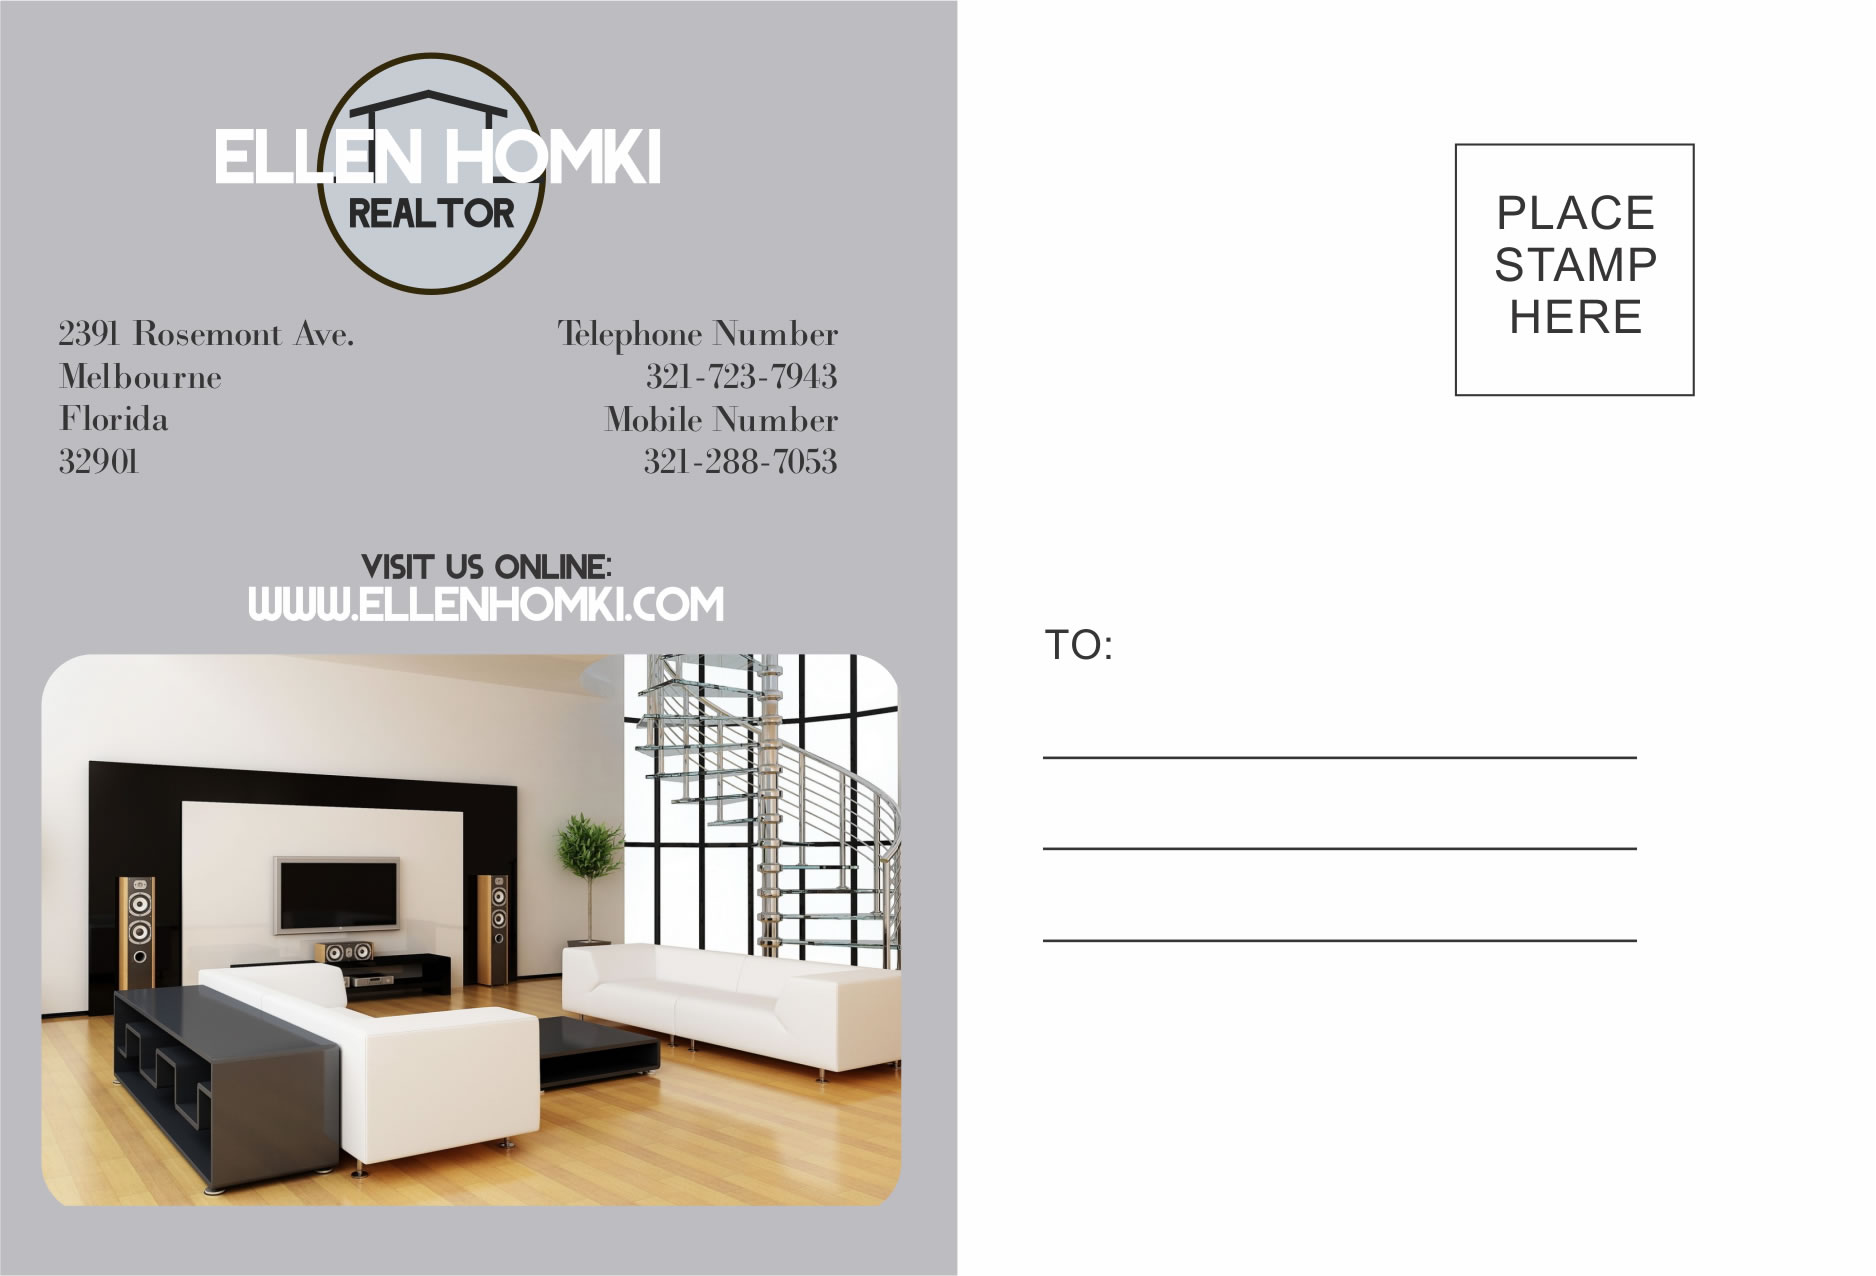 Postcard/Mailer